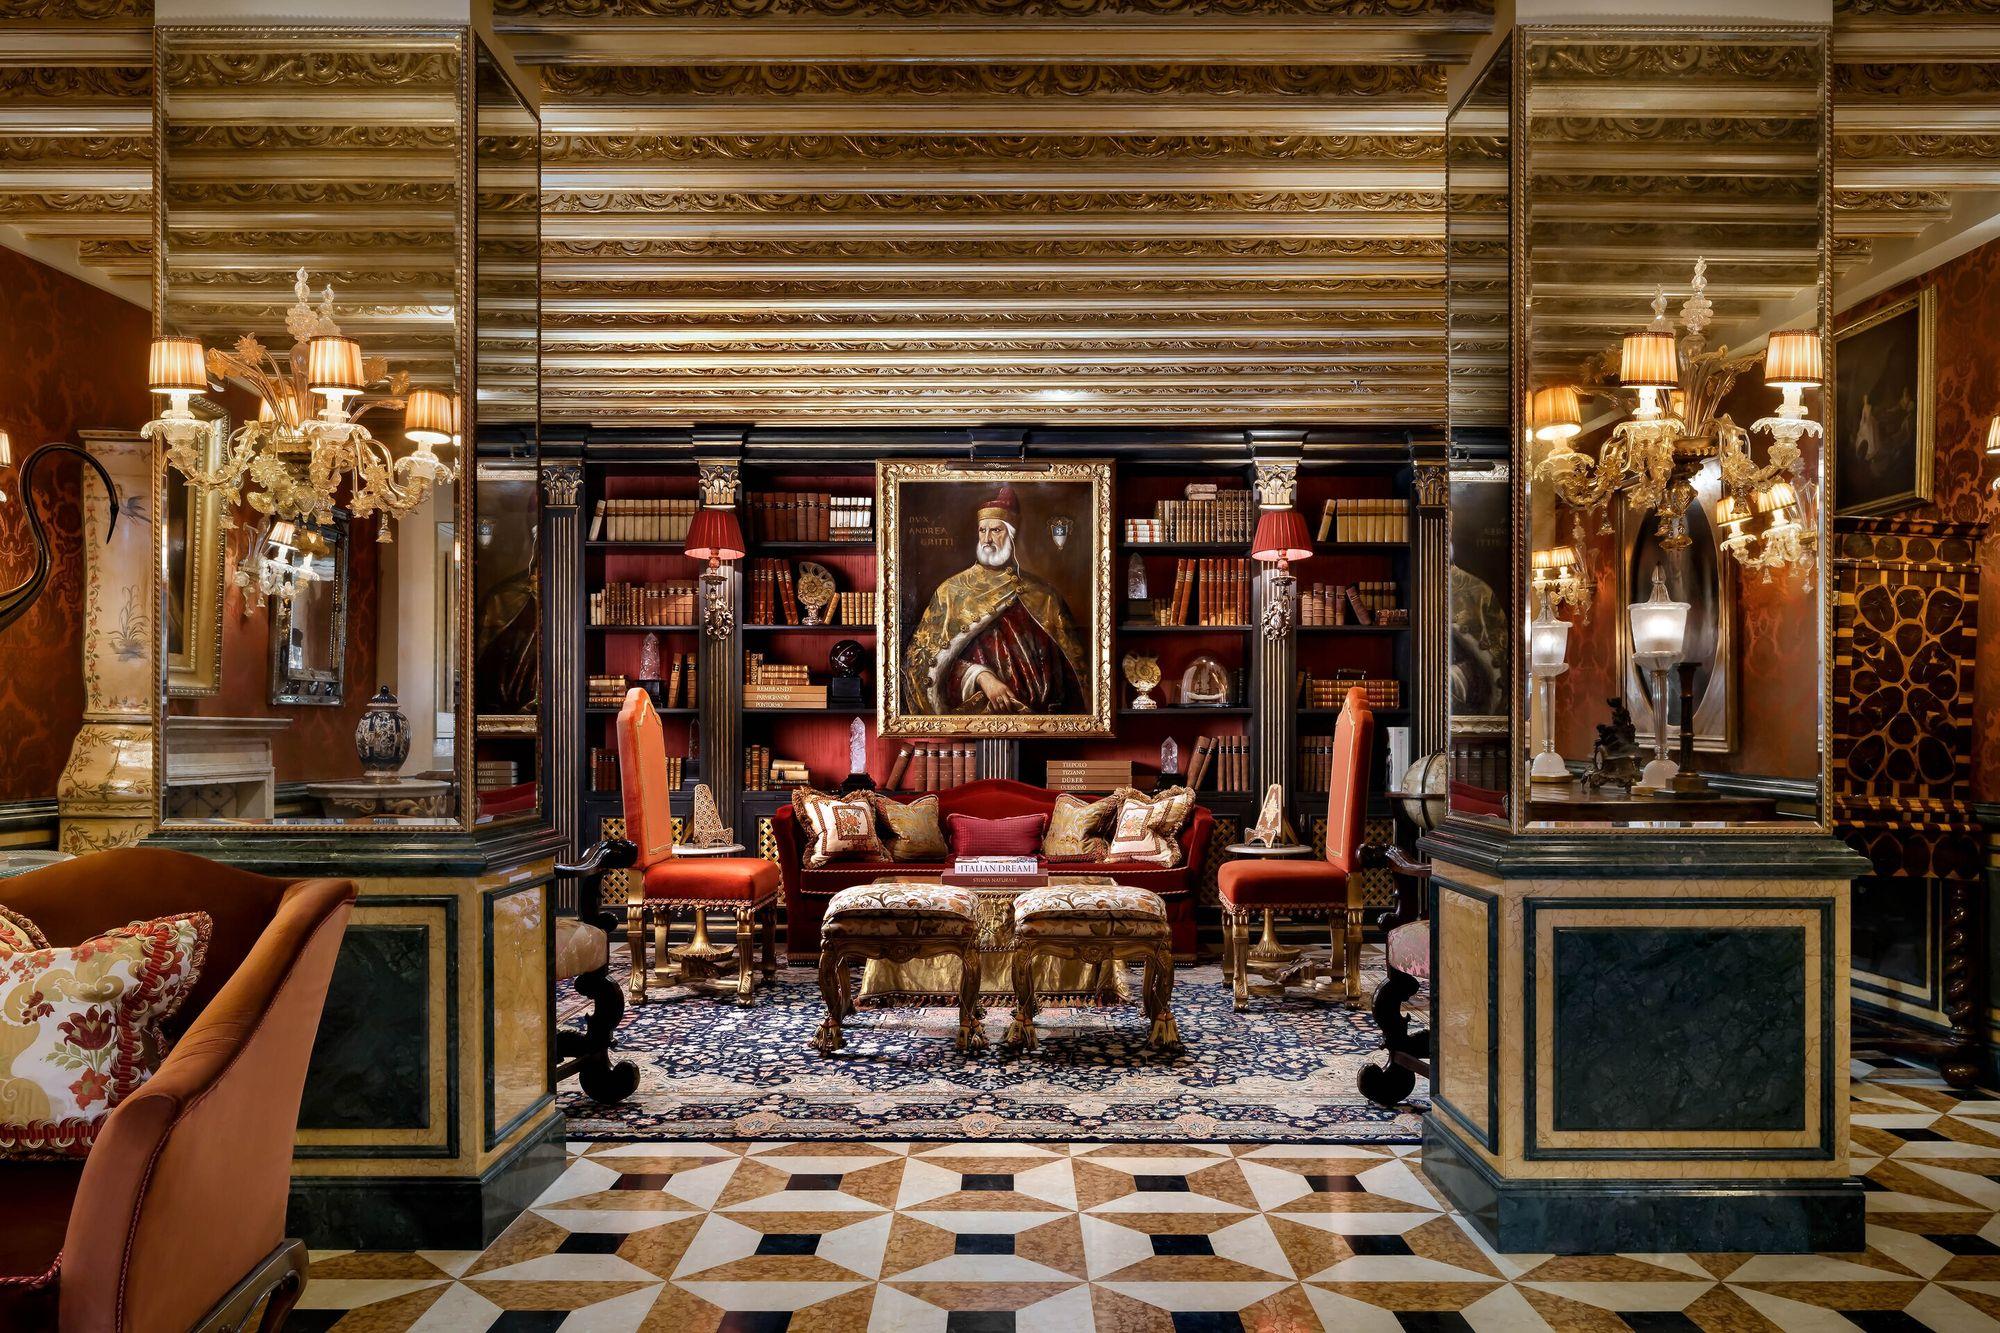 A sensory overload awaits at this 15th-century Venetian palazzo.